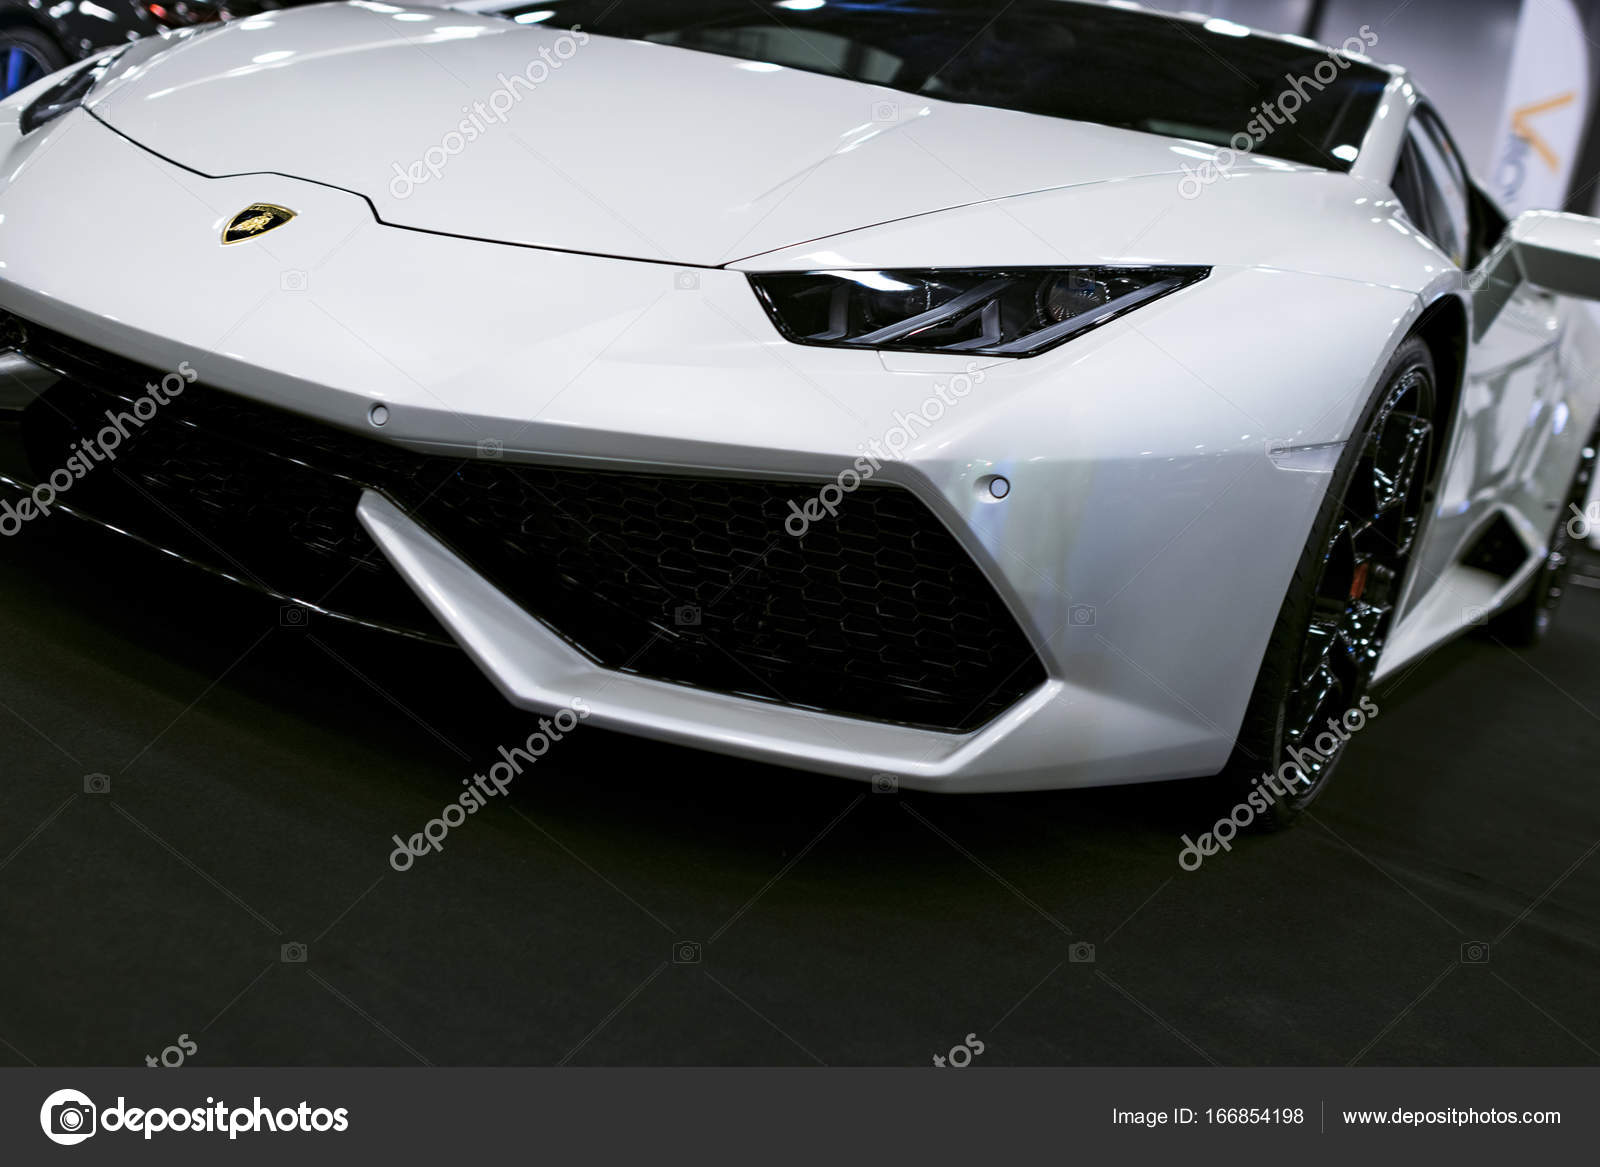 Front View Of A White Luxury Sport Car Lamborghini Huracan Lp 610 4